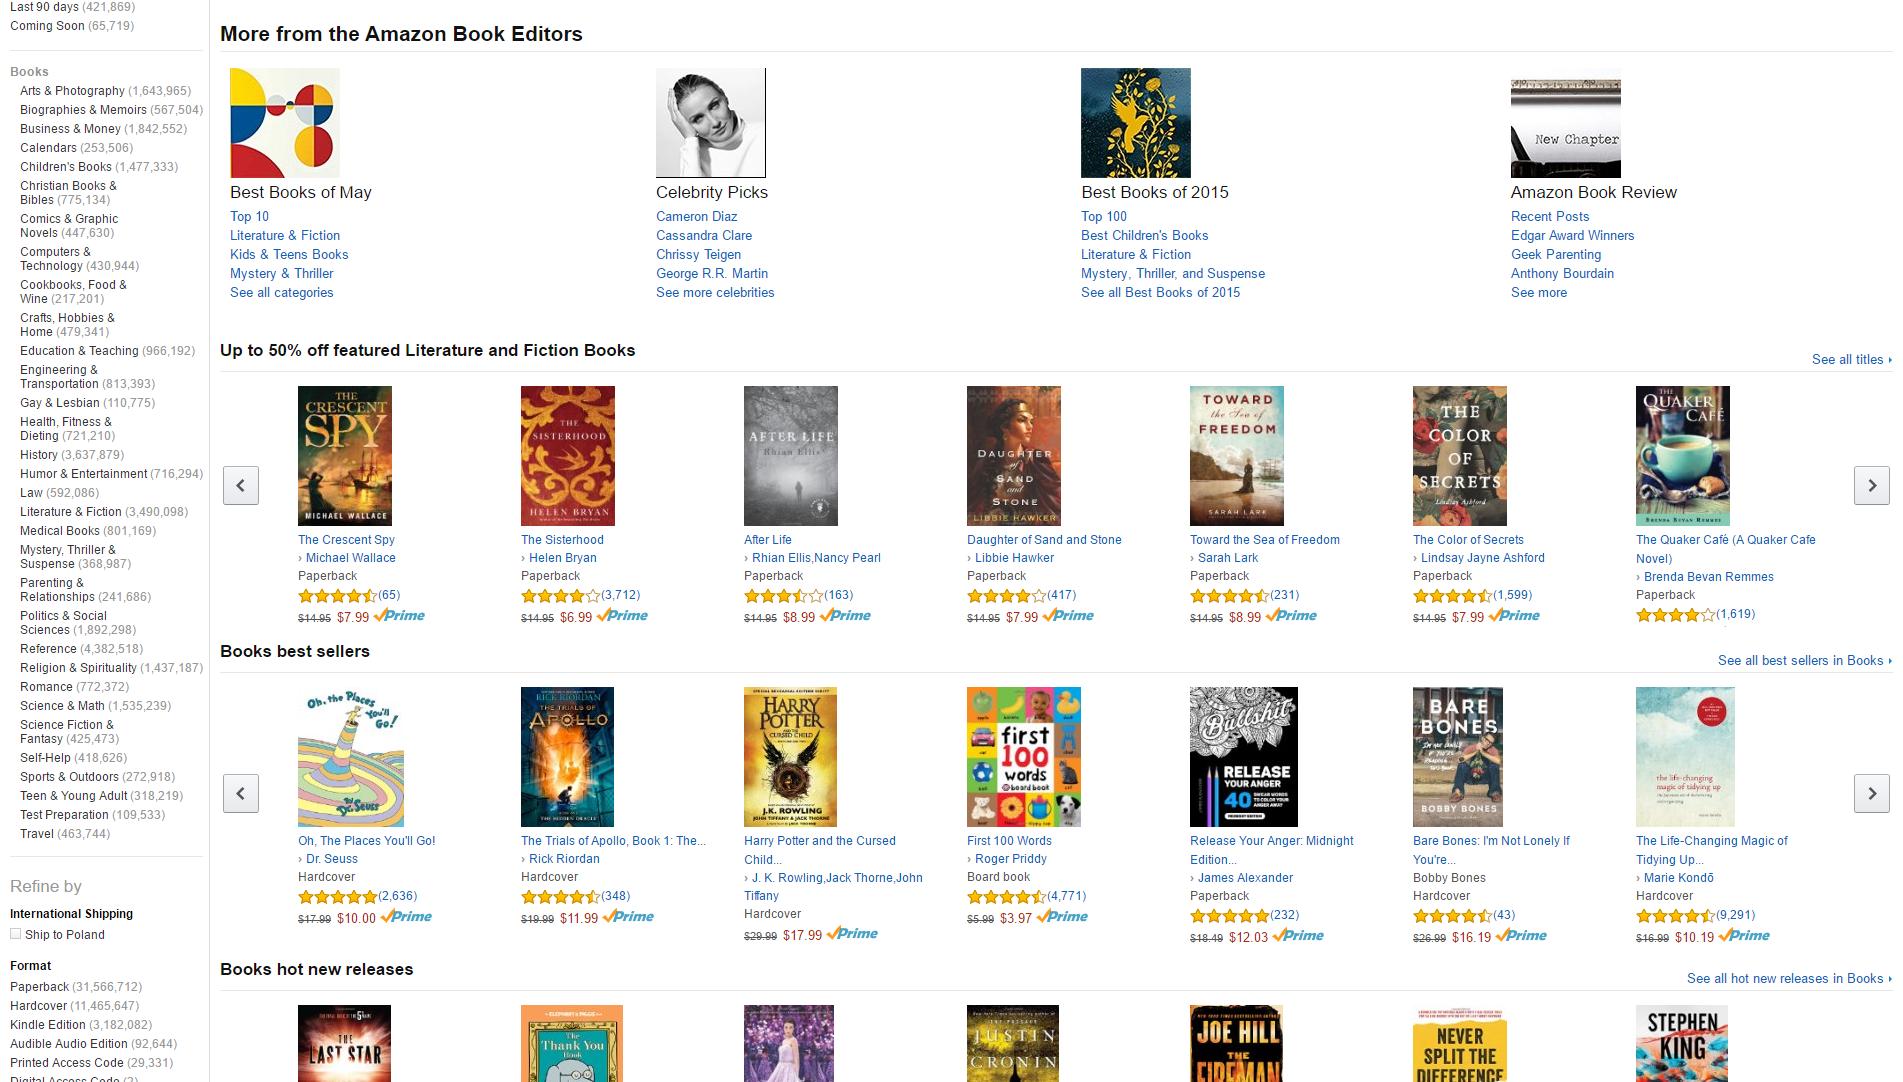 Amazon.com Books